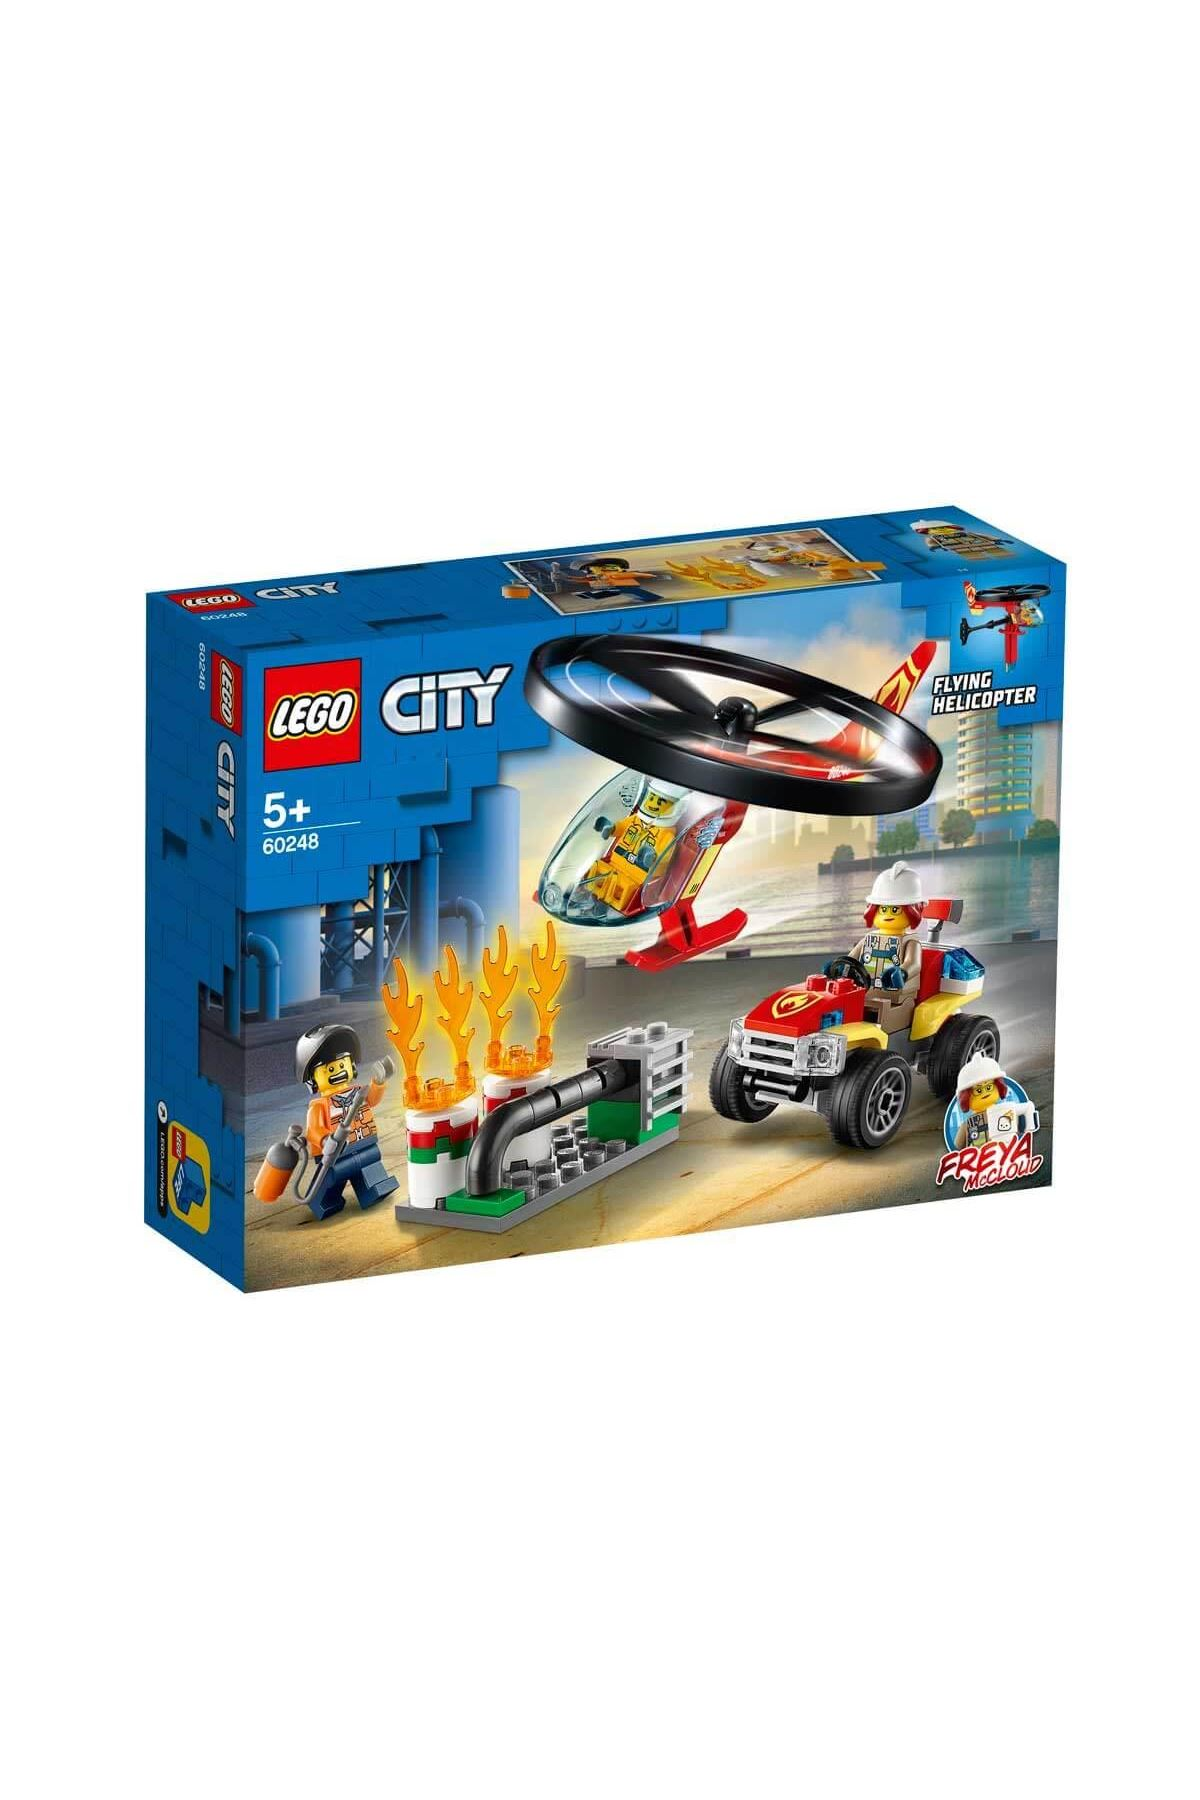 Lego City İtfaiye Helikopteri Müdahalesi 60248